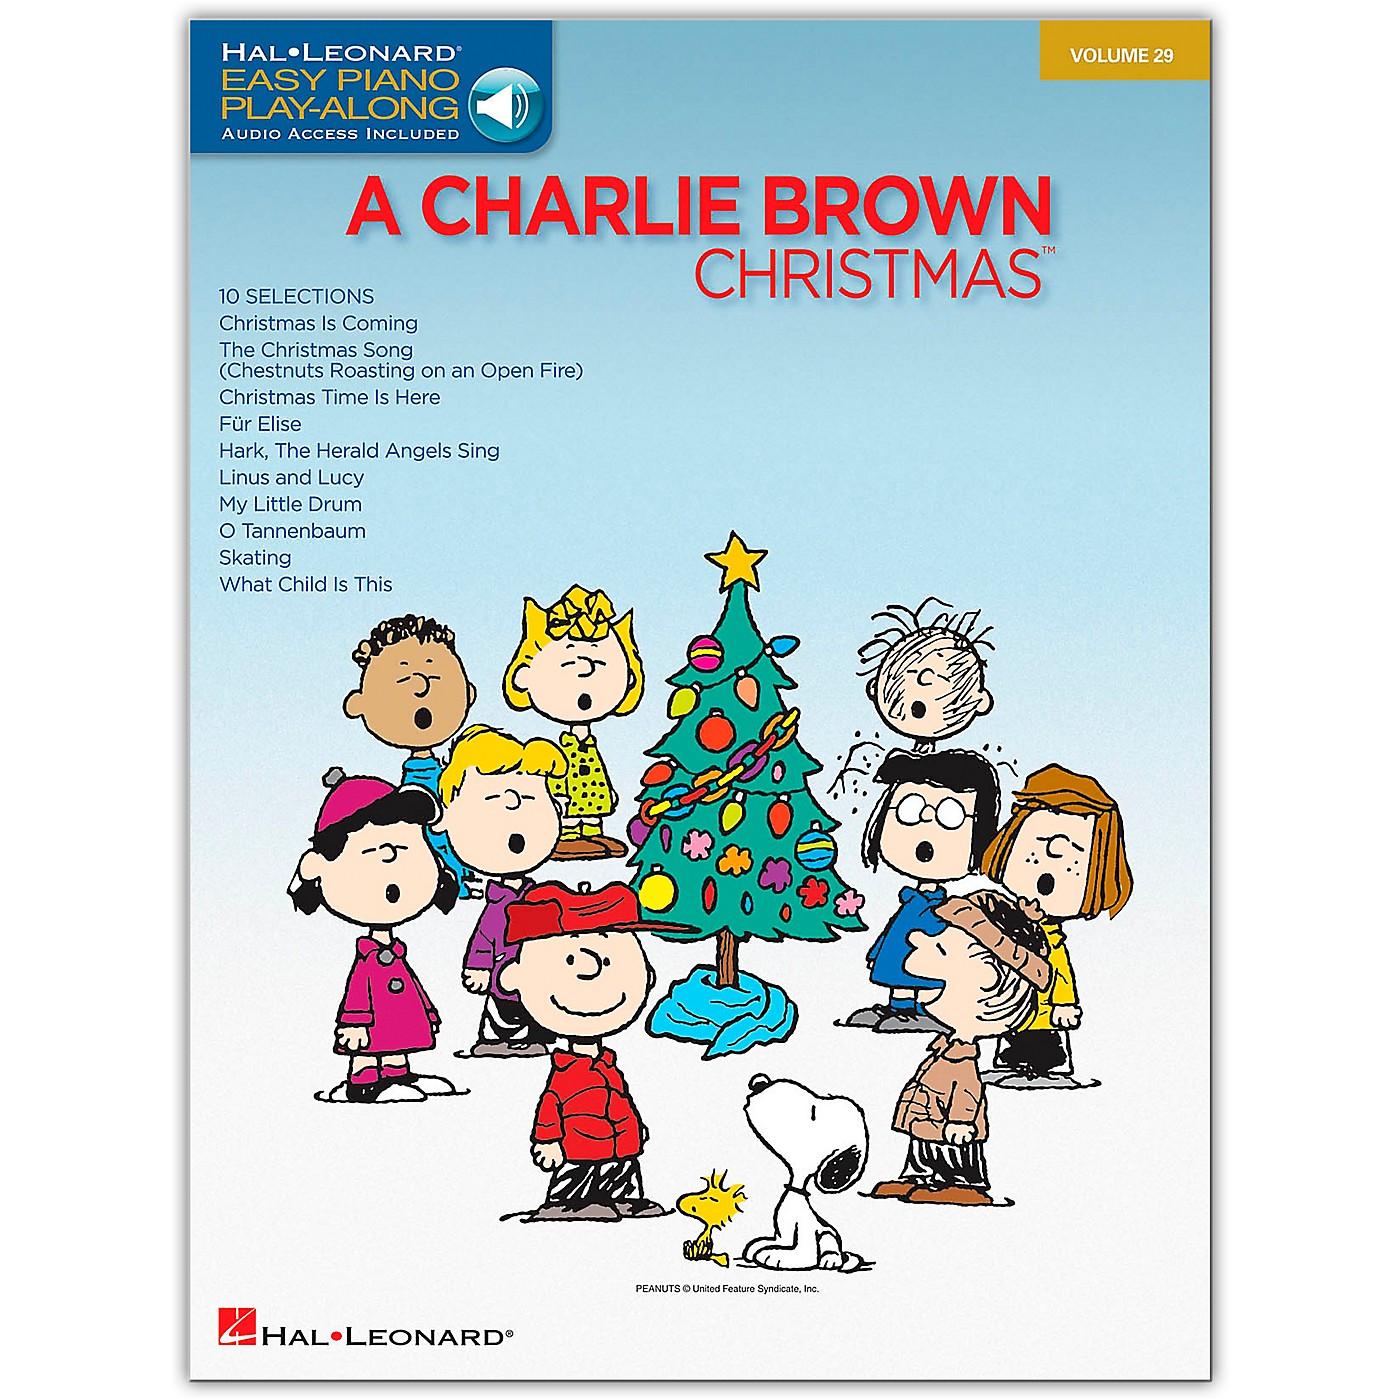 Hal Leonard Charlie Brown Christmas - Easy Piano Play-Along Volume 29 (Book/Online Audio) thumbnail